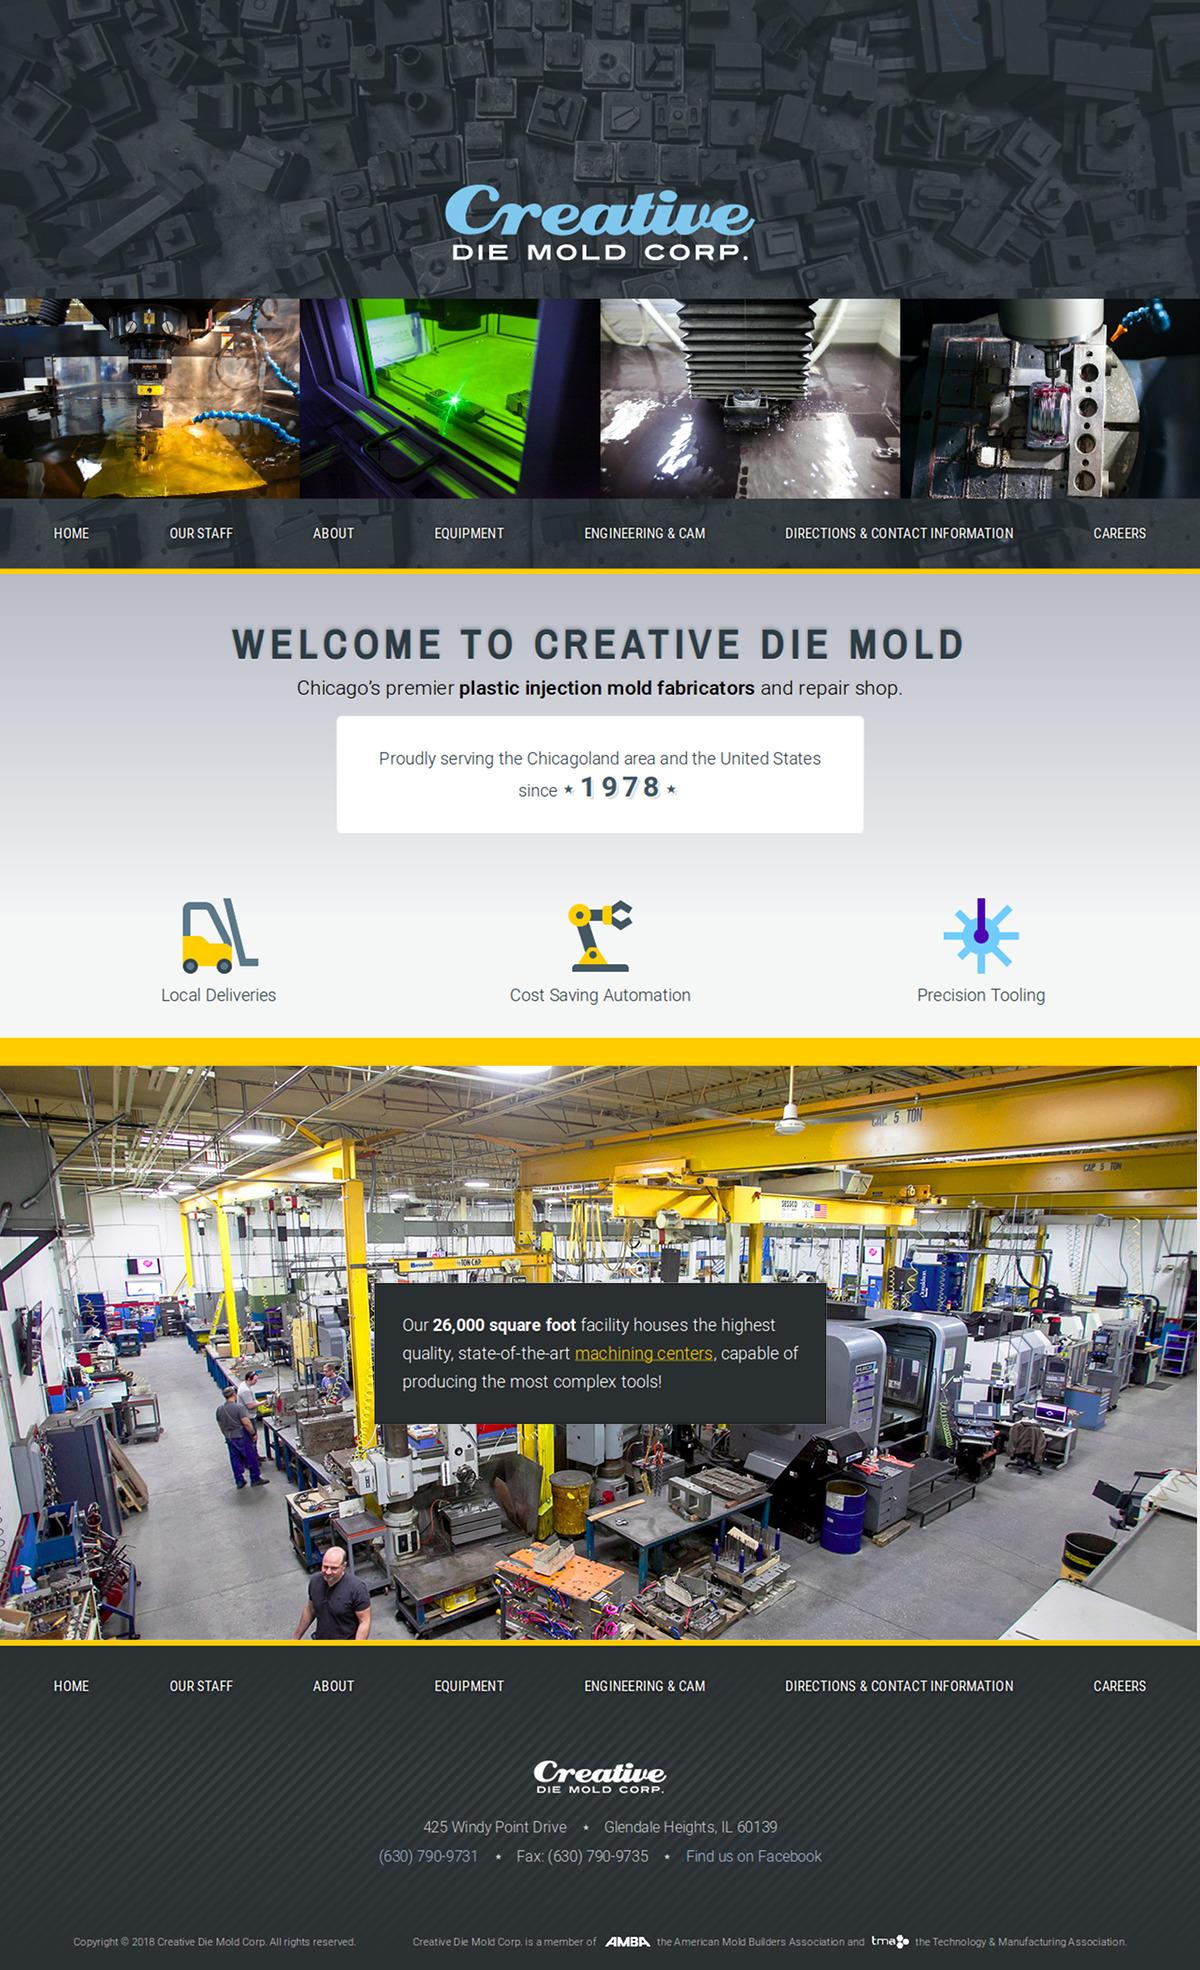 Creative Die Mold Corp.